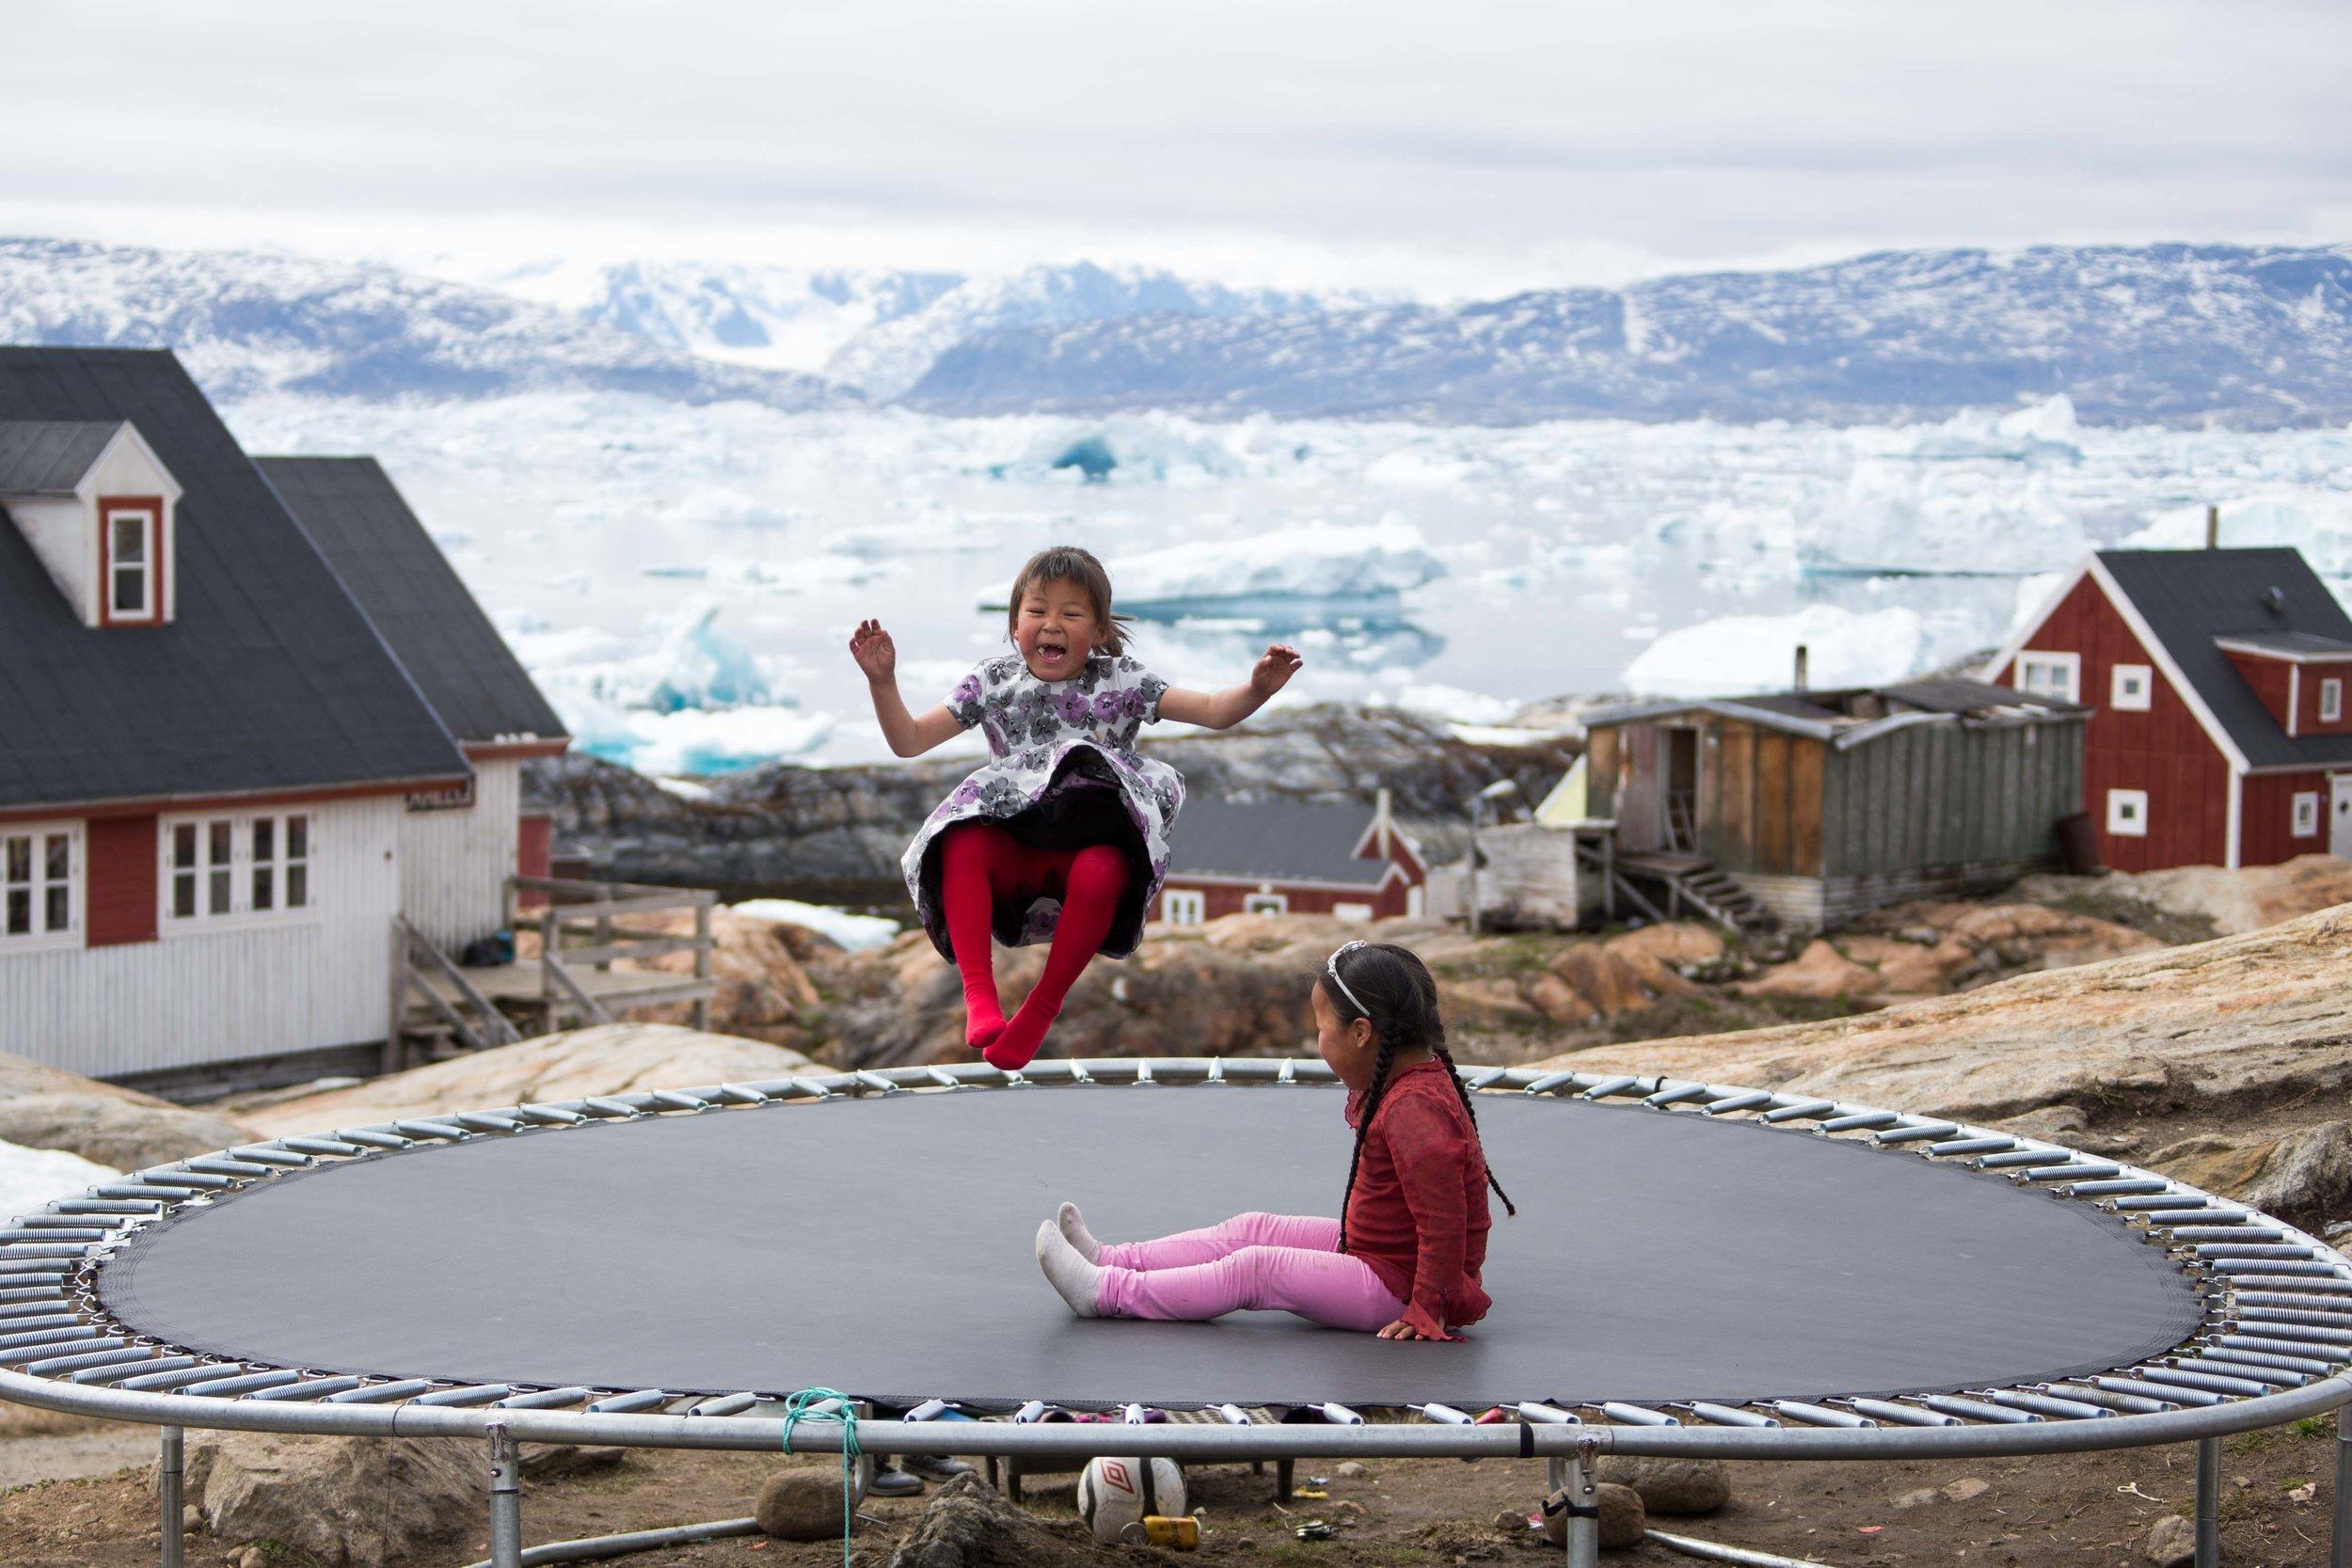 Two little girls bounce on a trampoline in Tinit, East Greenland. Photo: Matt Reichel.